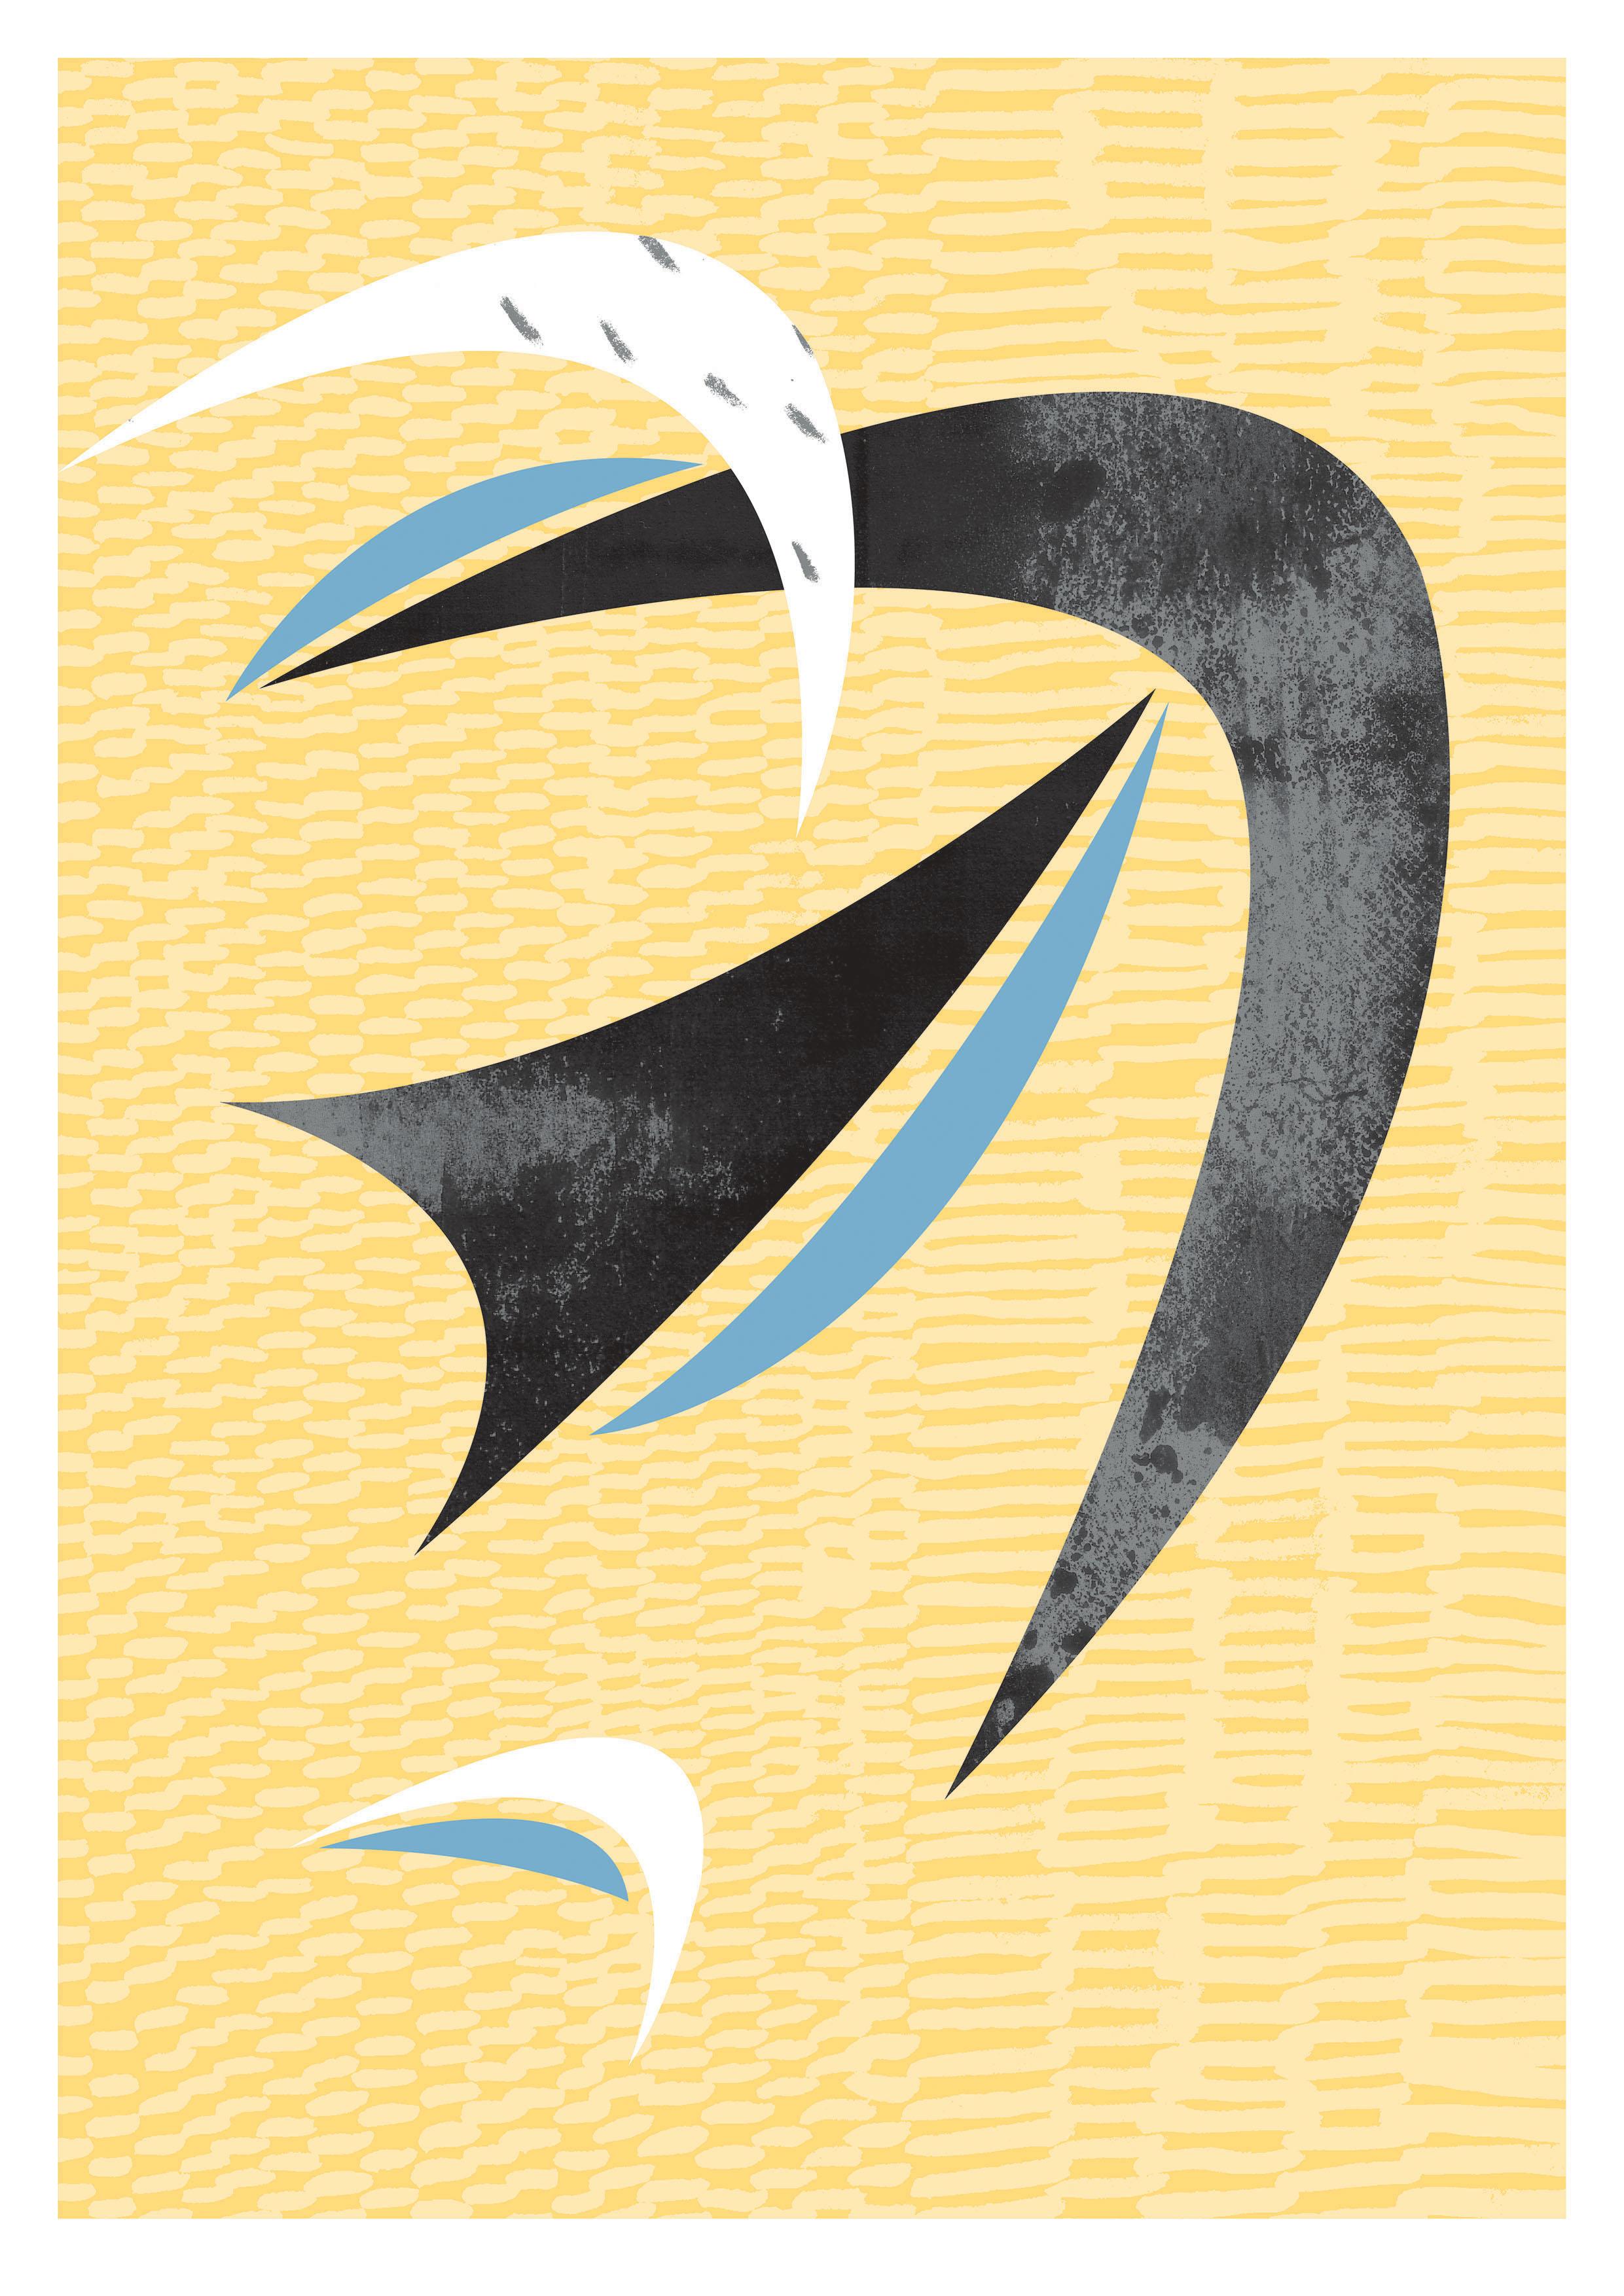 kels-osullivan-taking-flight-edition-giclee-390x560-©2016.jpg